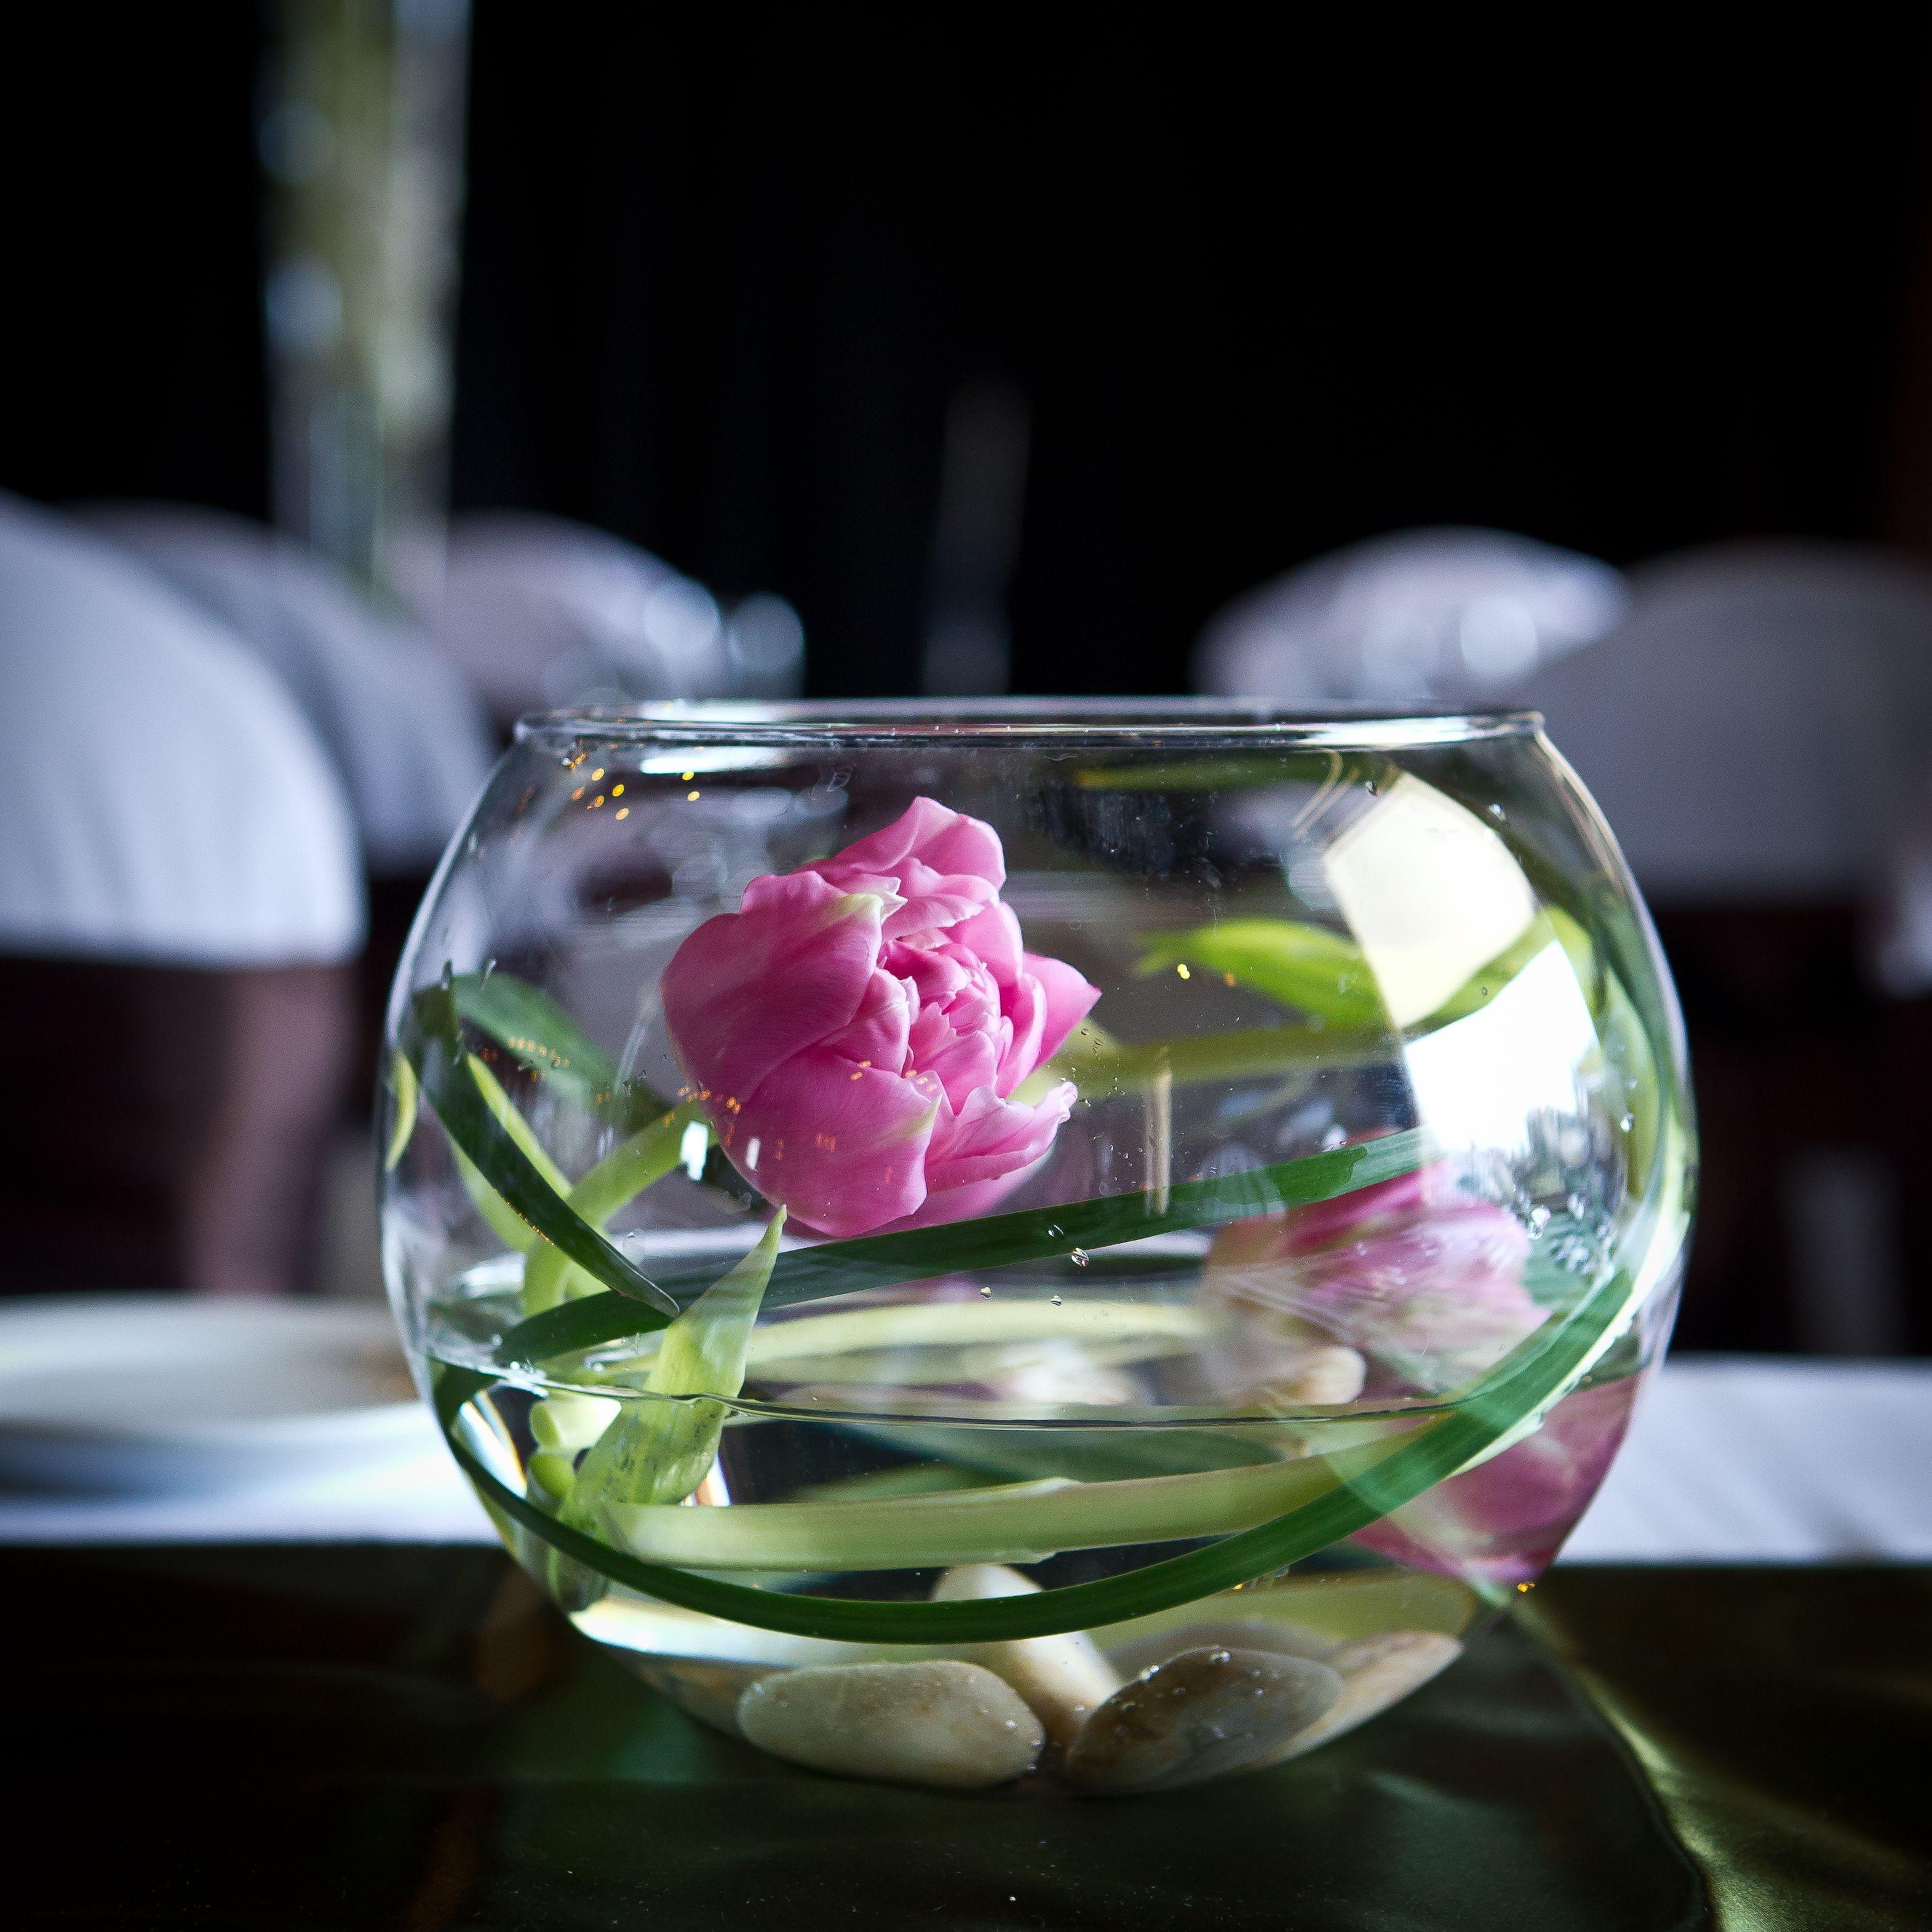 Cute Wedding Centerpiece Ideas: Wedding Centre Pieces & Decoration